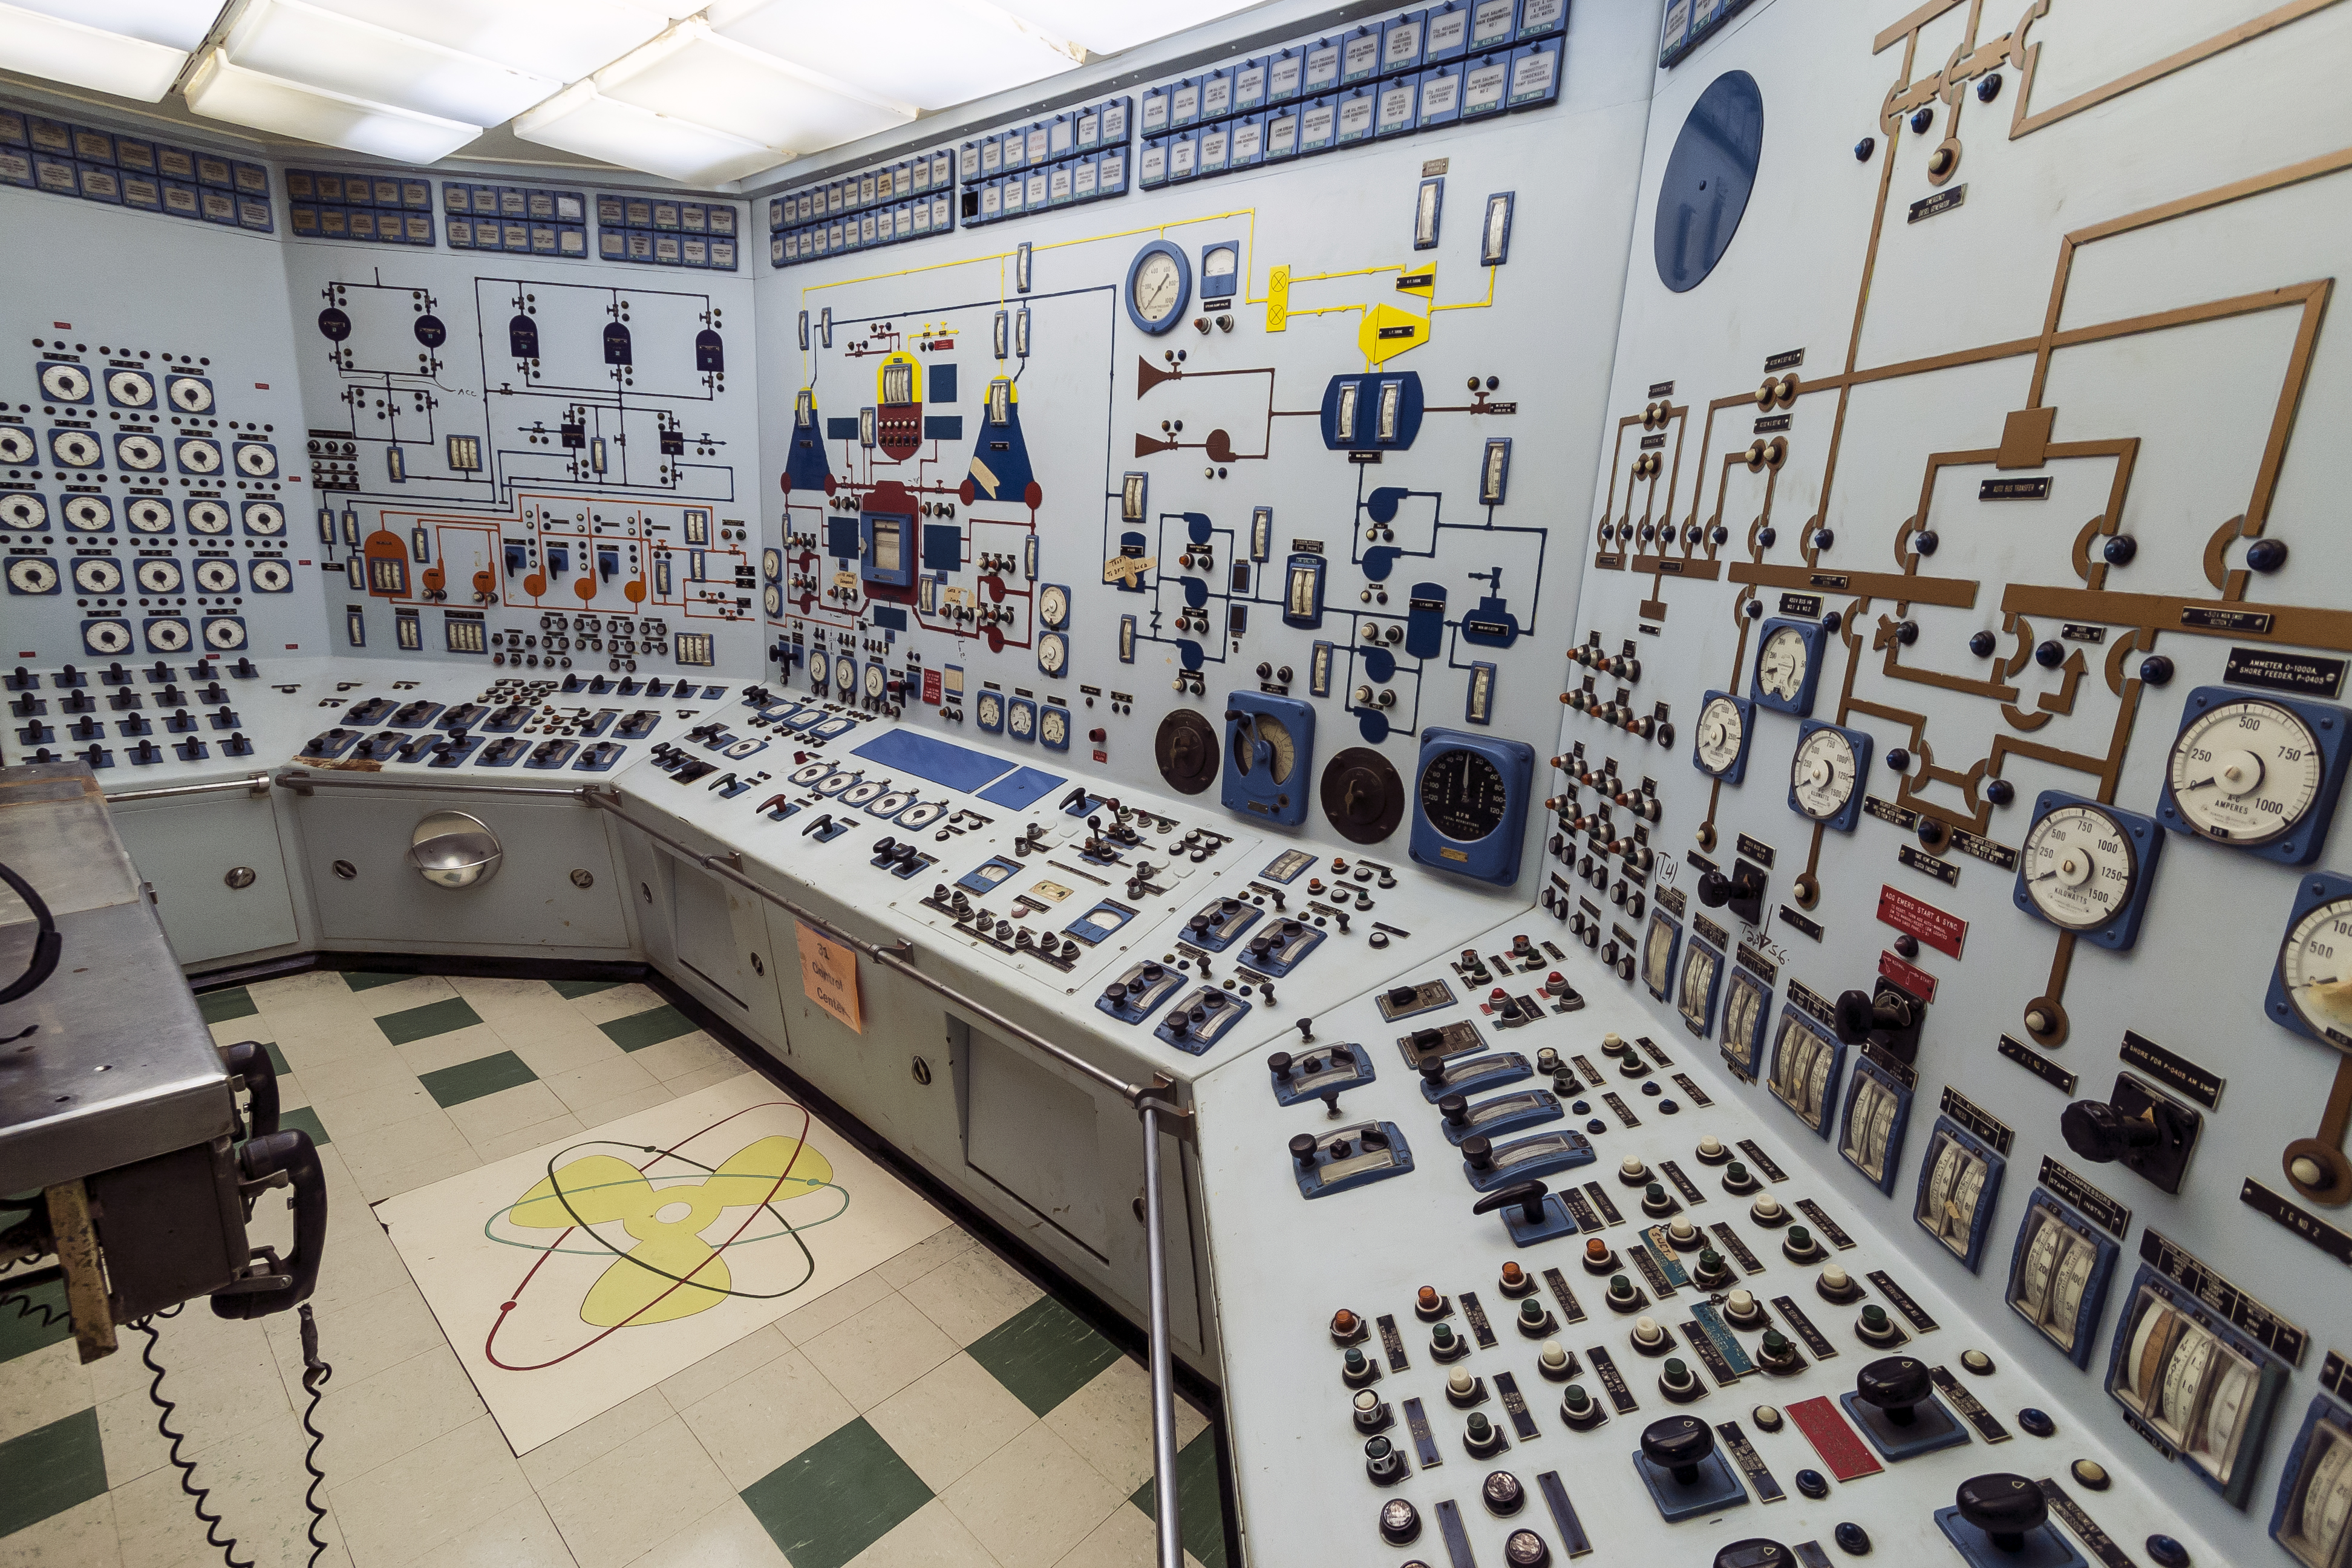 File:NS Savannah control room MD1.jpg - Wikimedia Commons